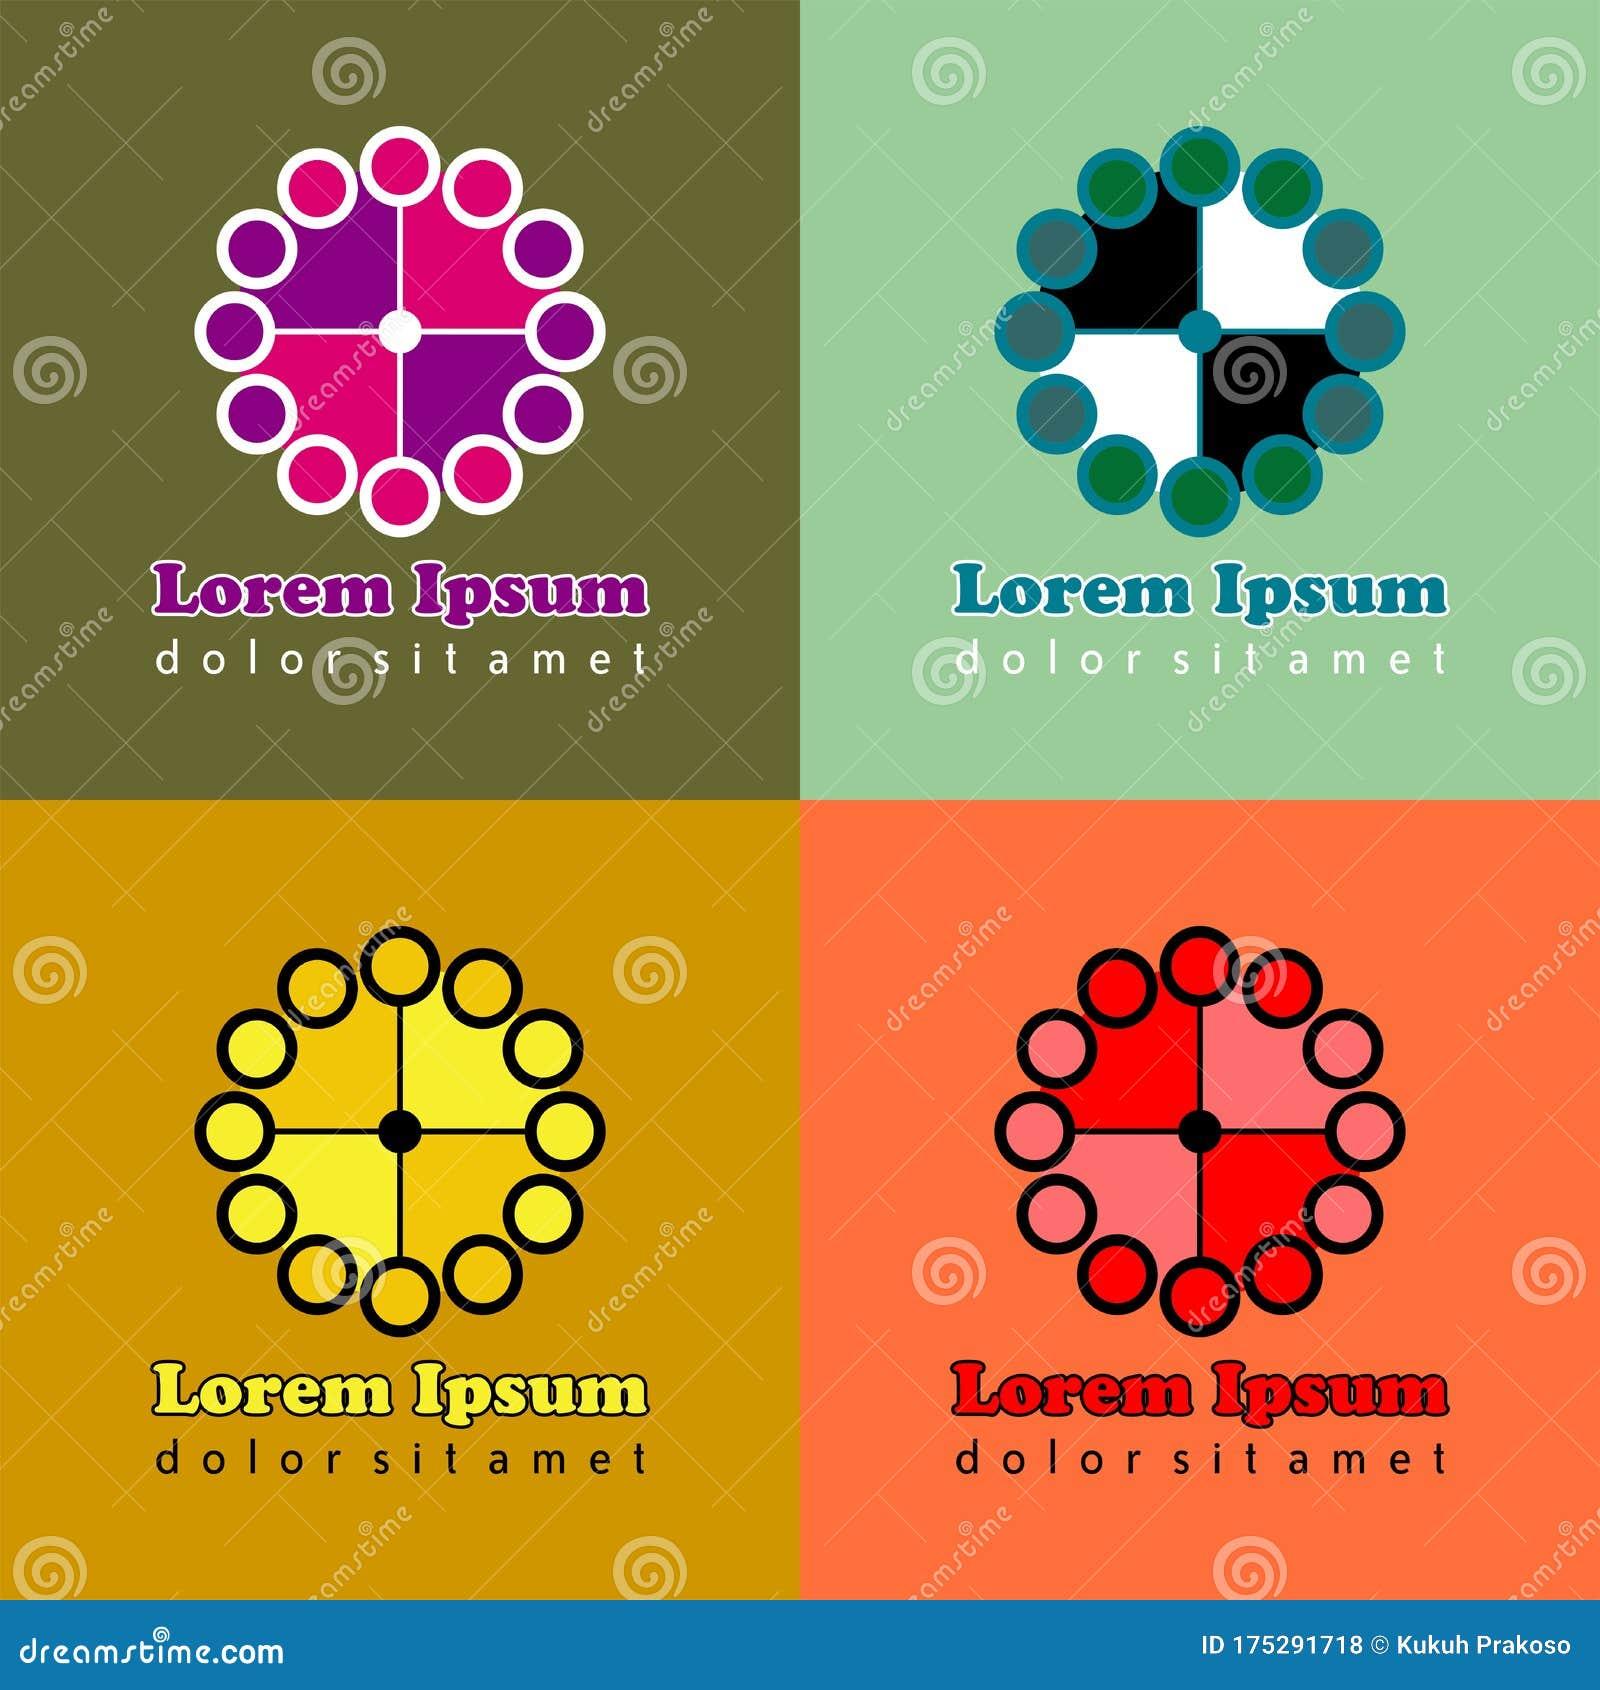 Simple Logo Design Templates Creative And Modern Designs Logo Stock Vector Illustration Of Circle Graphic 175291718,Minimalist Kitchen Design Black